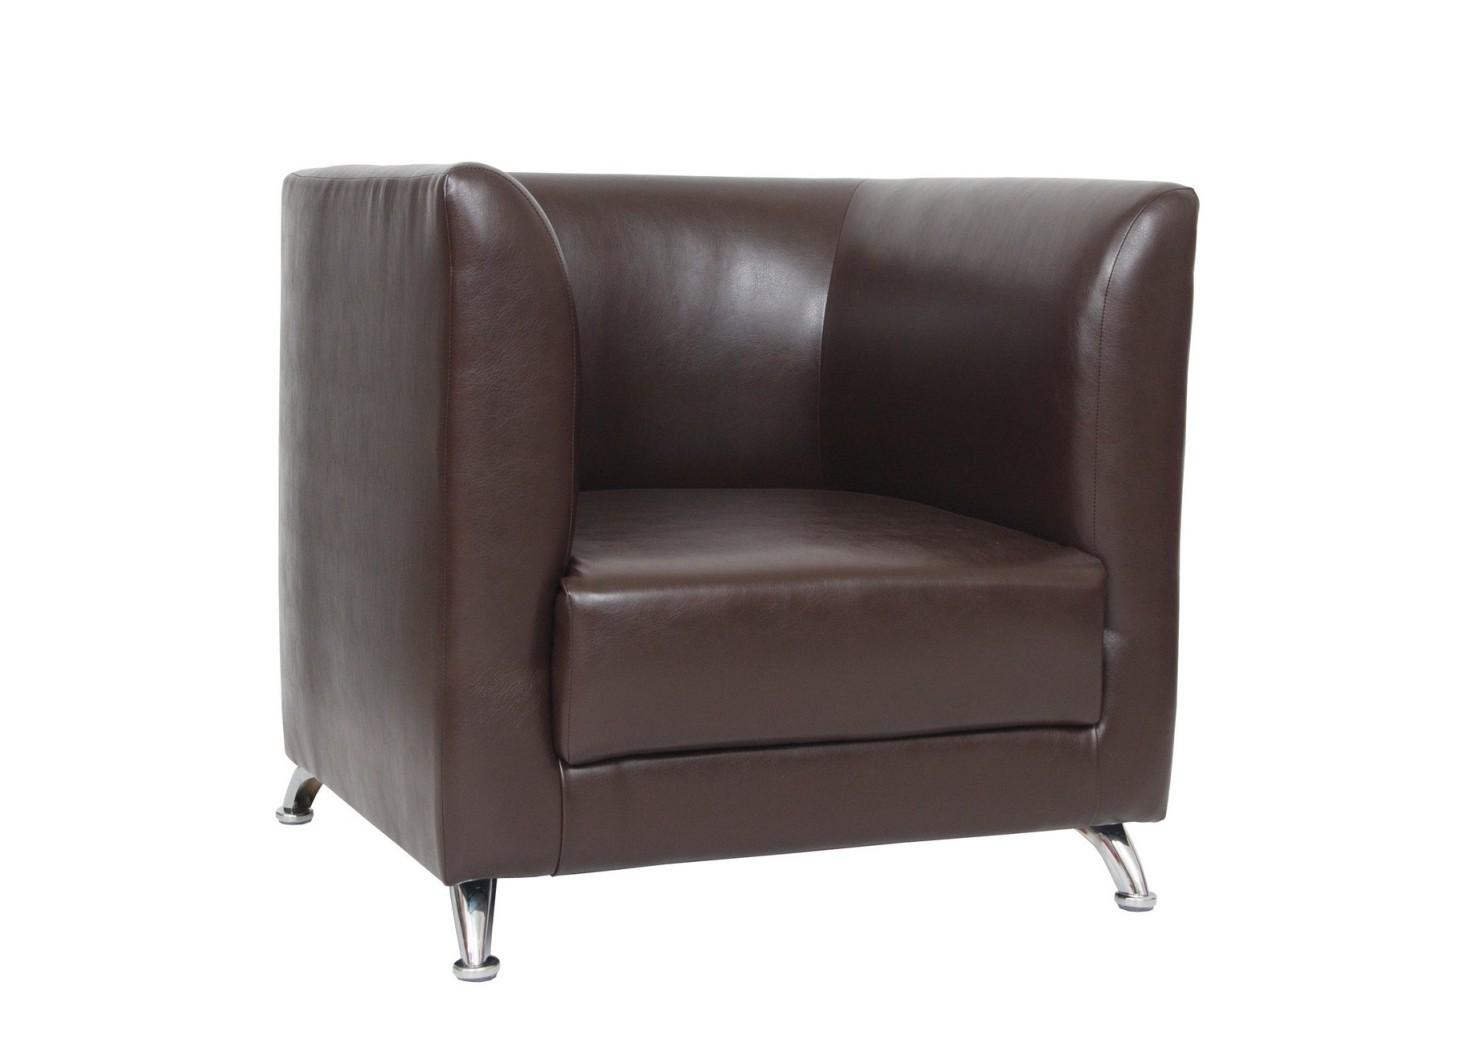 Подвесное кресло МДВ 15688673 от mebel-top.ru